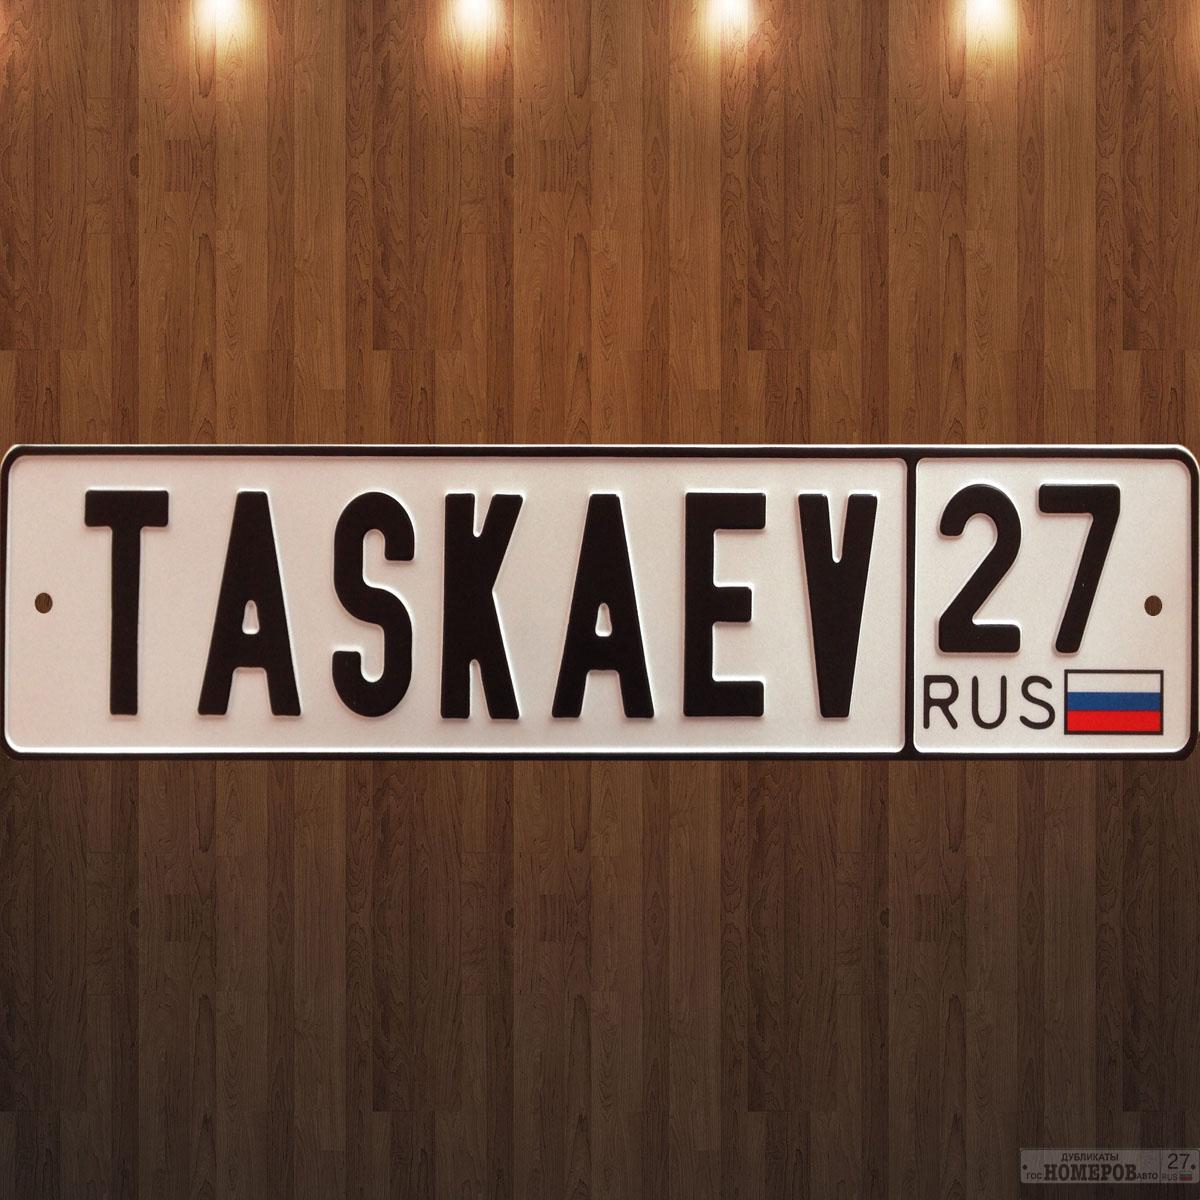 Таскаев.jpg